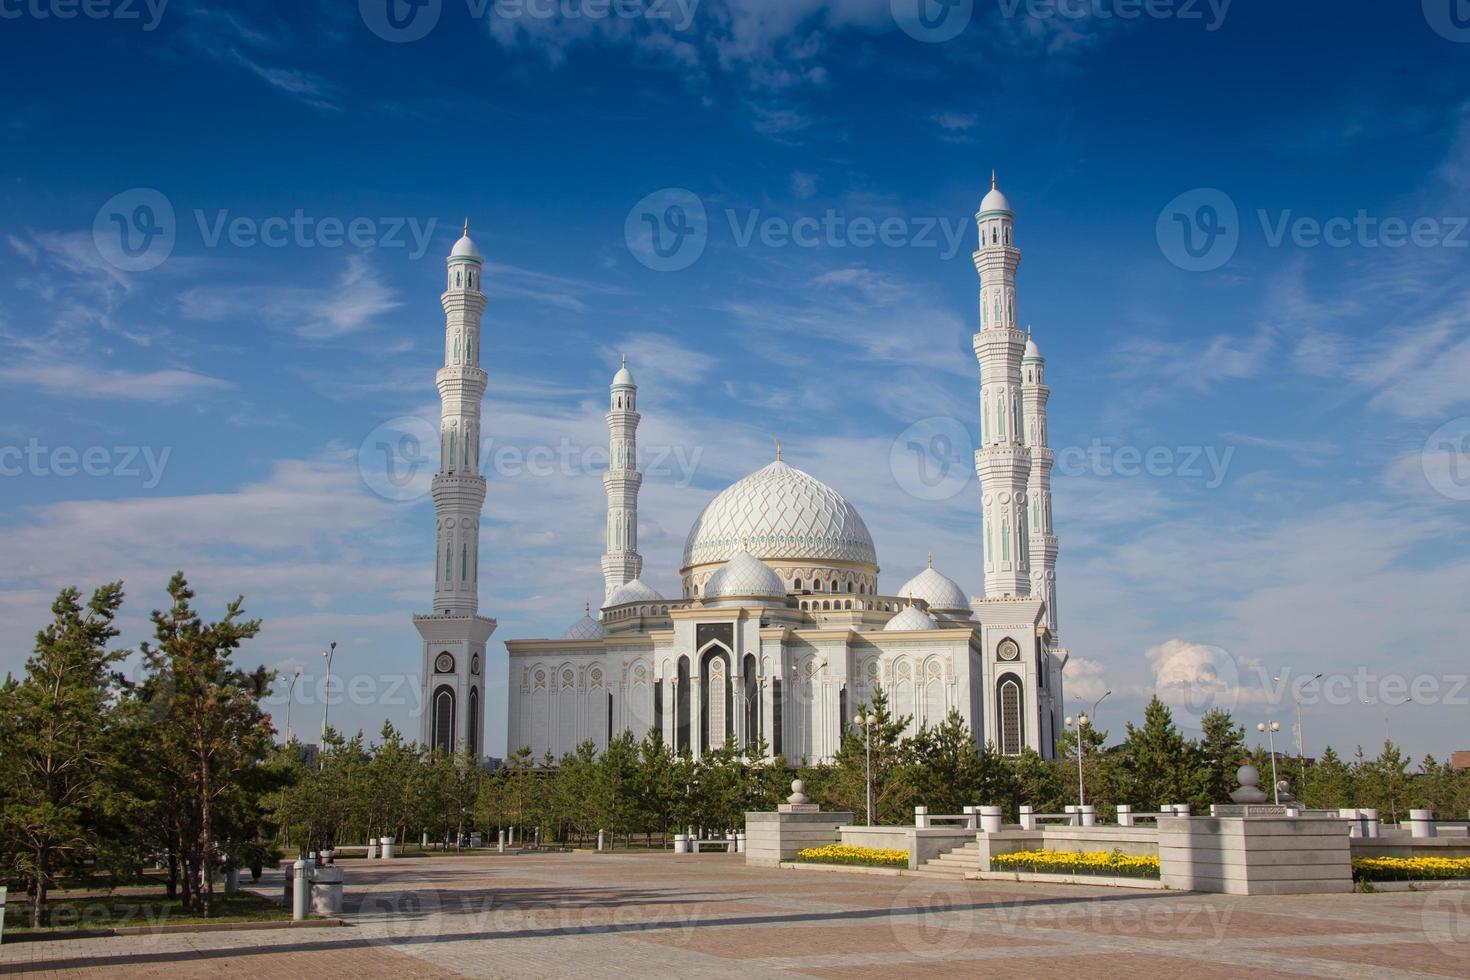 Yeni Cami Moschee in Astsana, Kasachstan foto